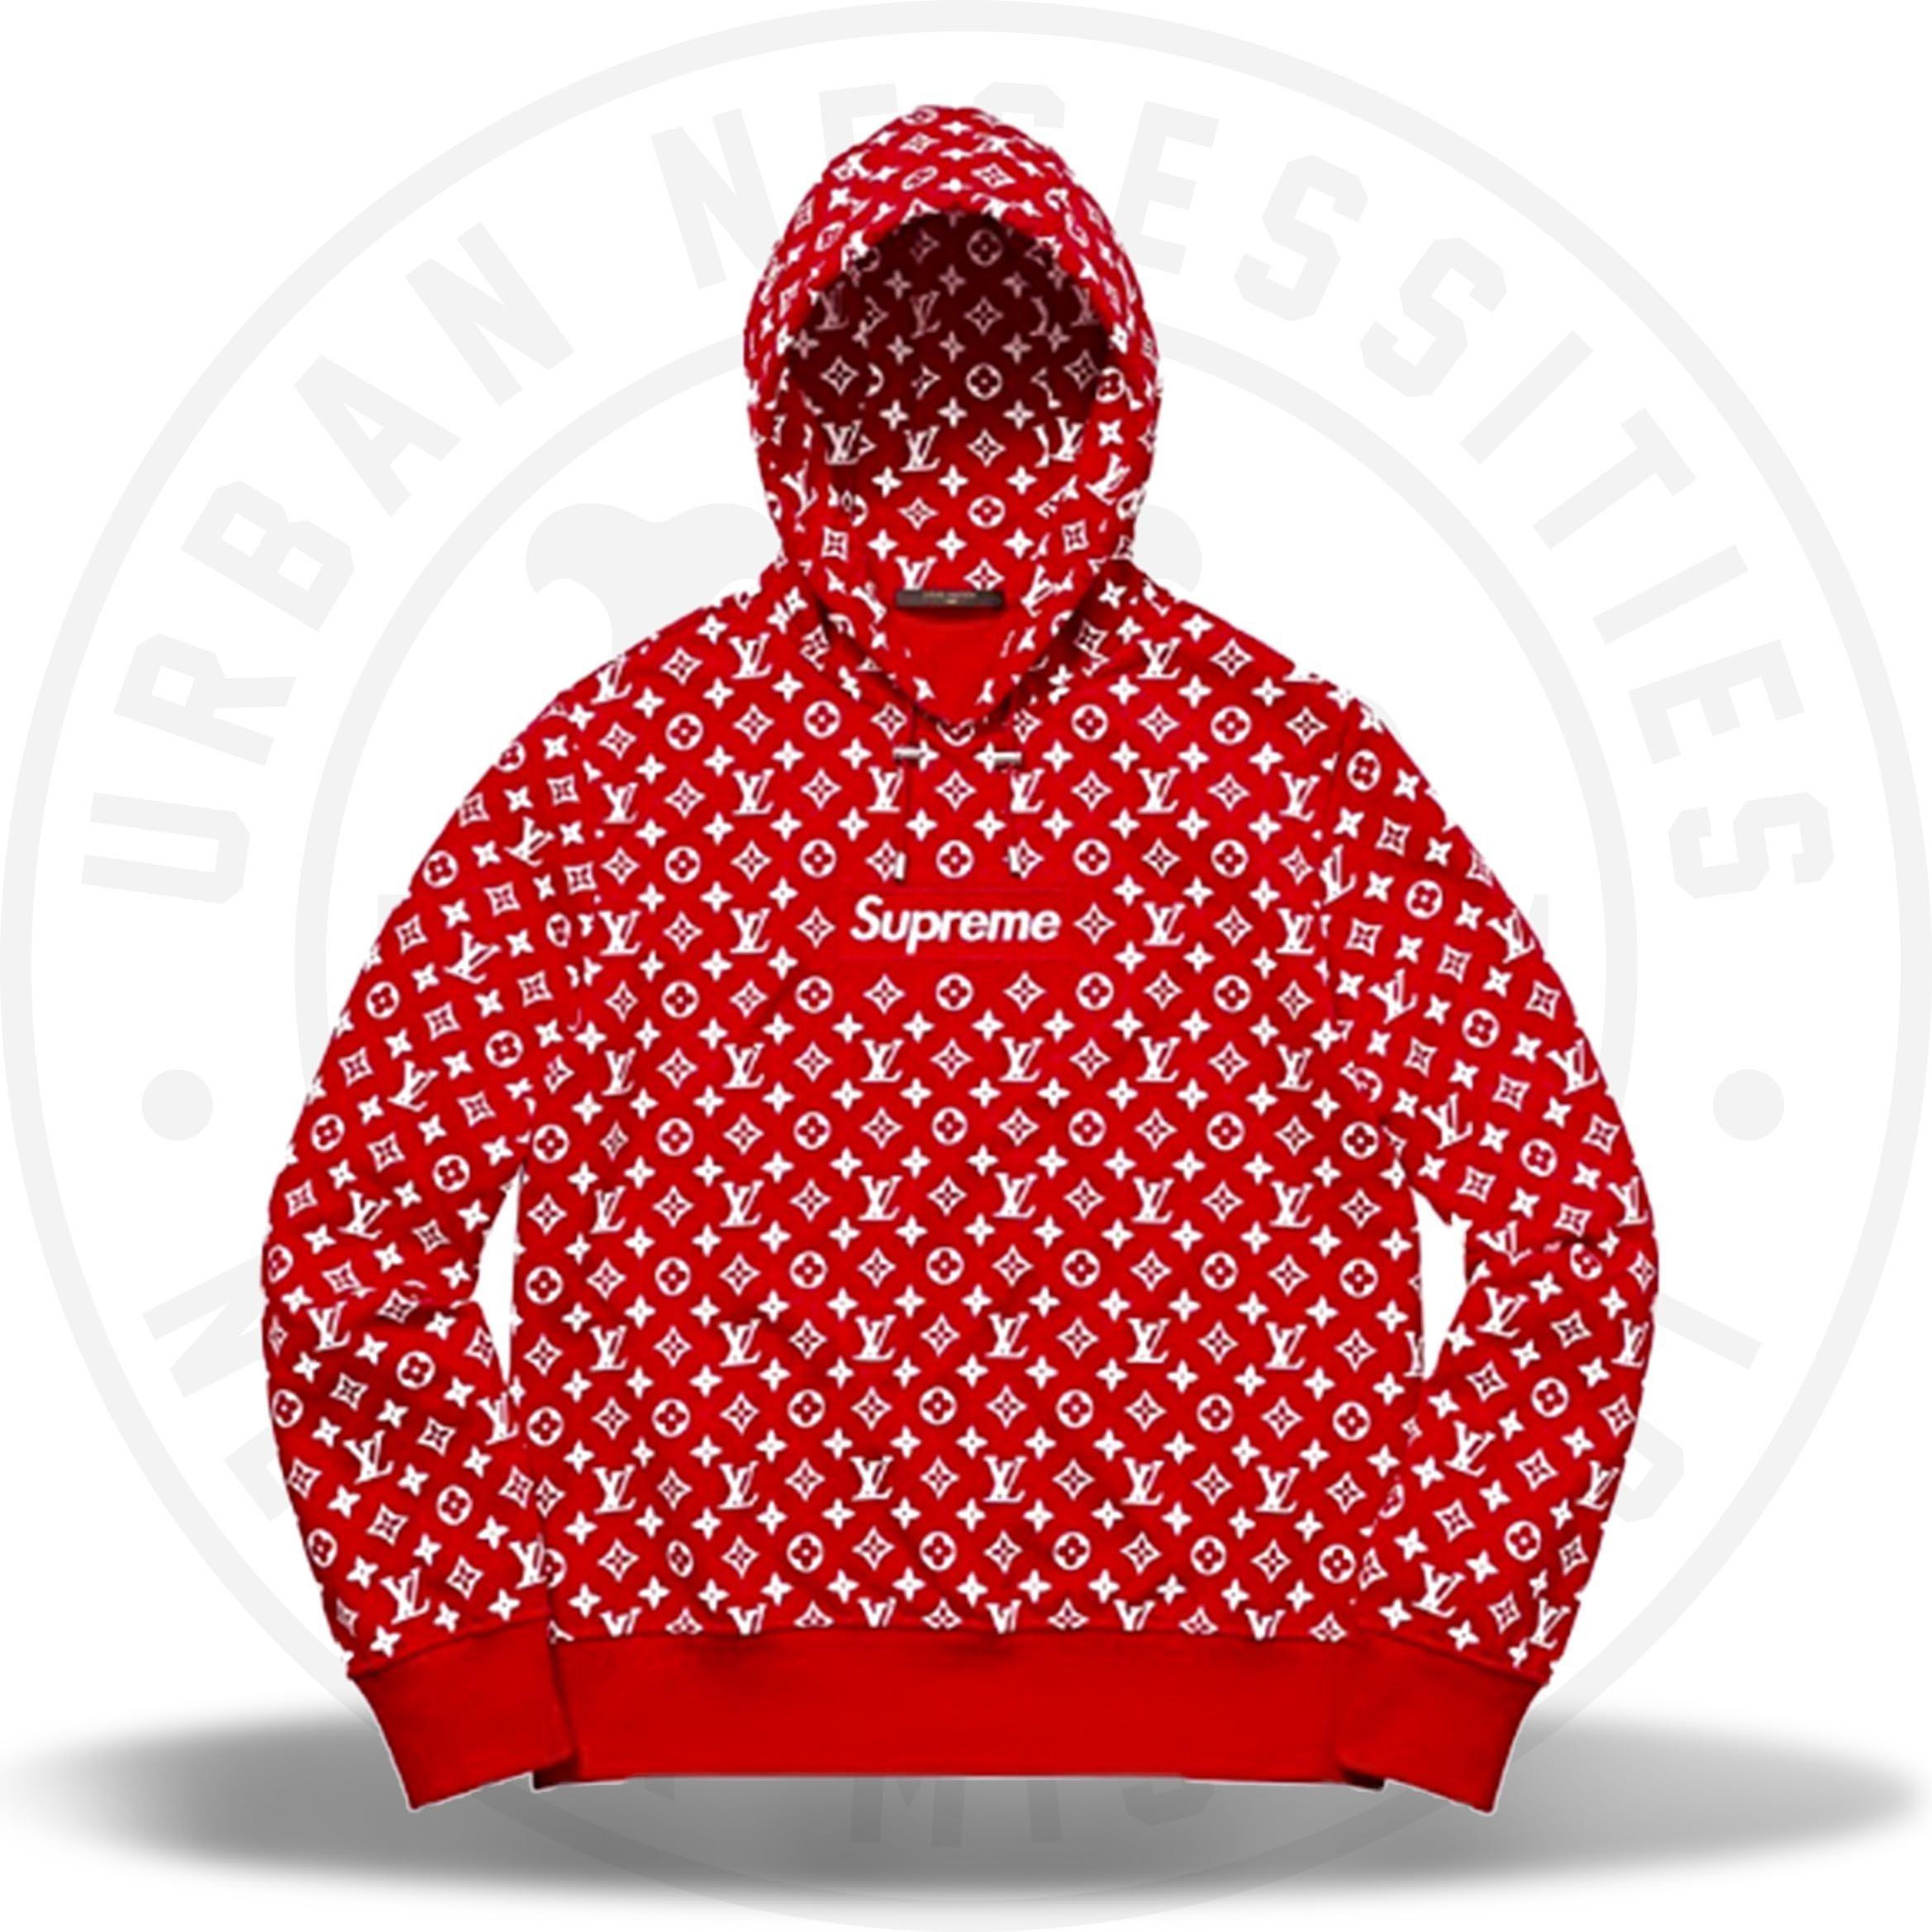 Louis Vuitton Supreme Box Logo Hooded Sweatshirt.